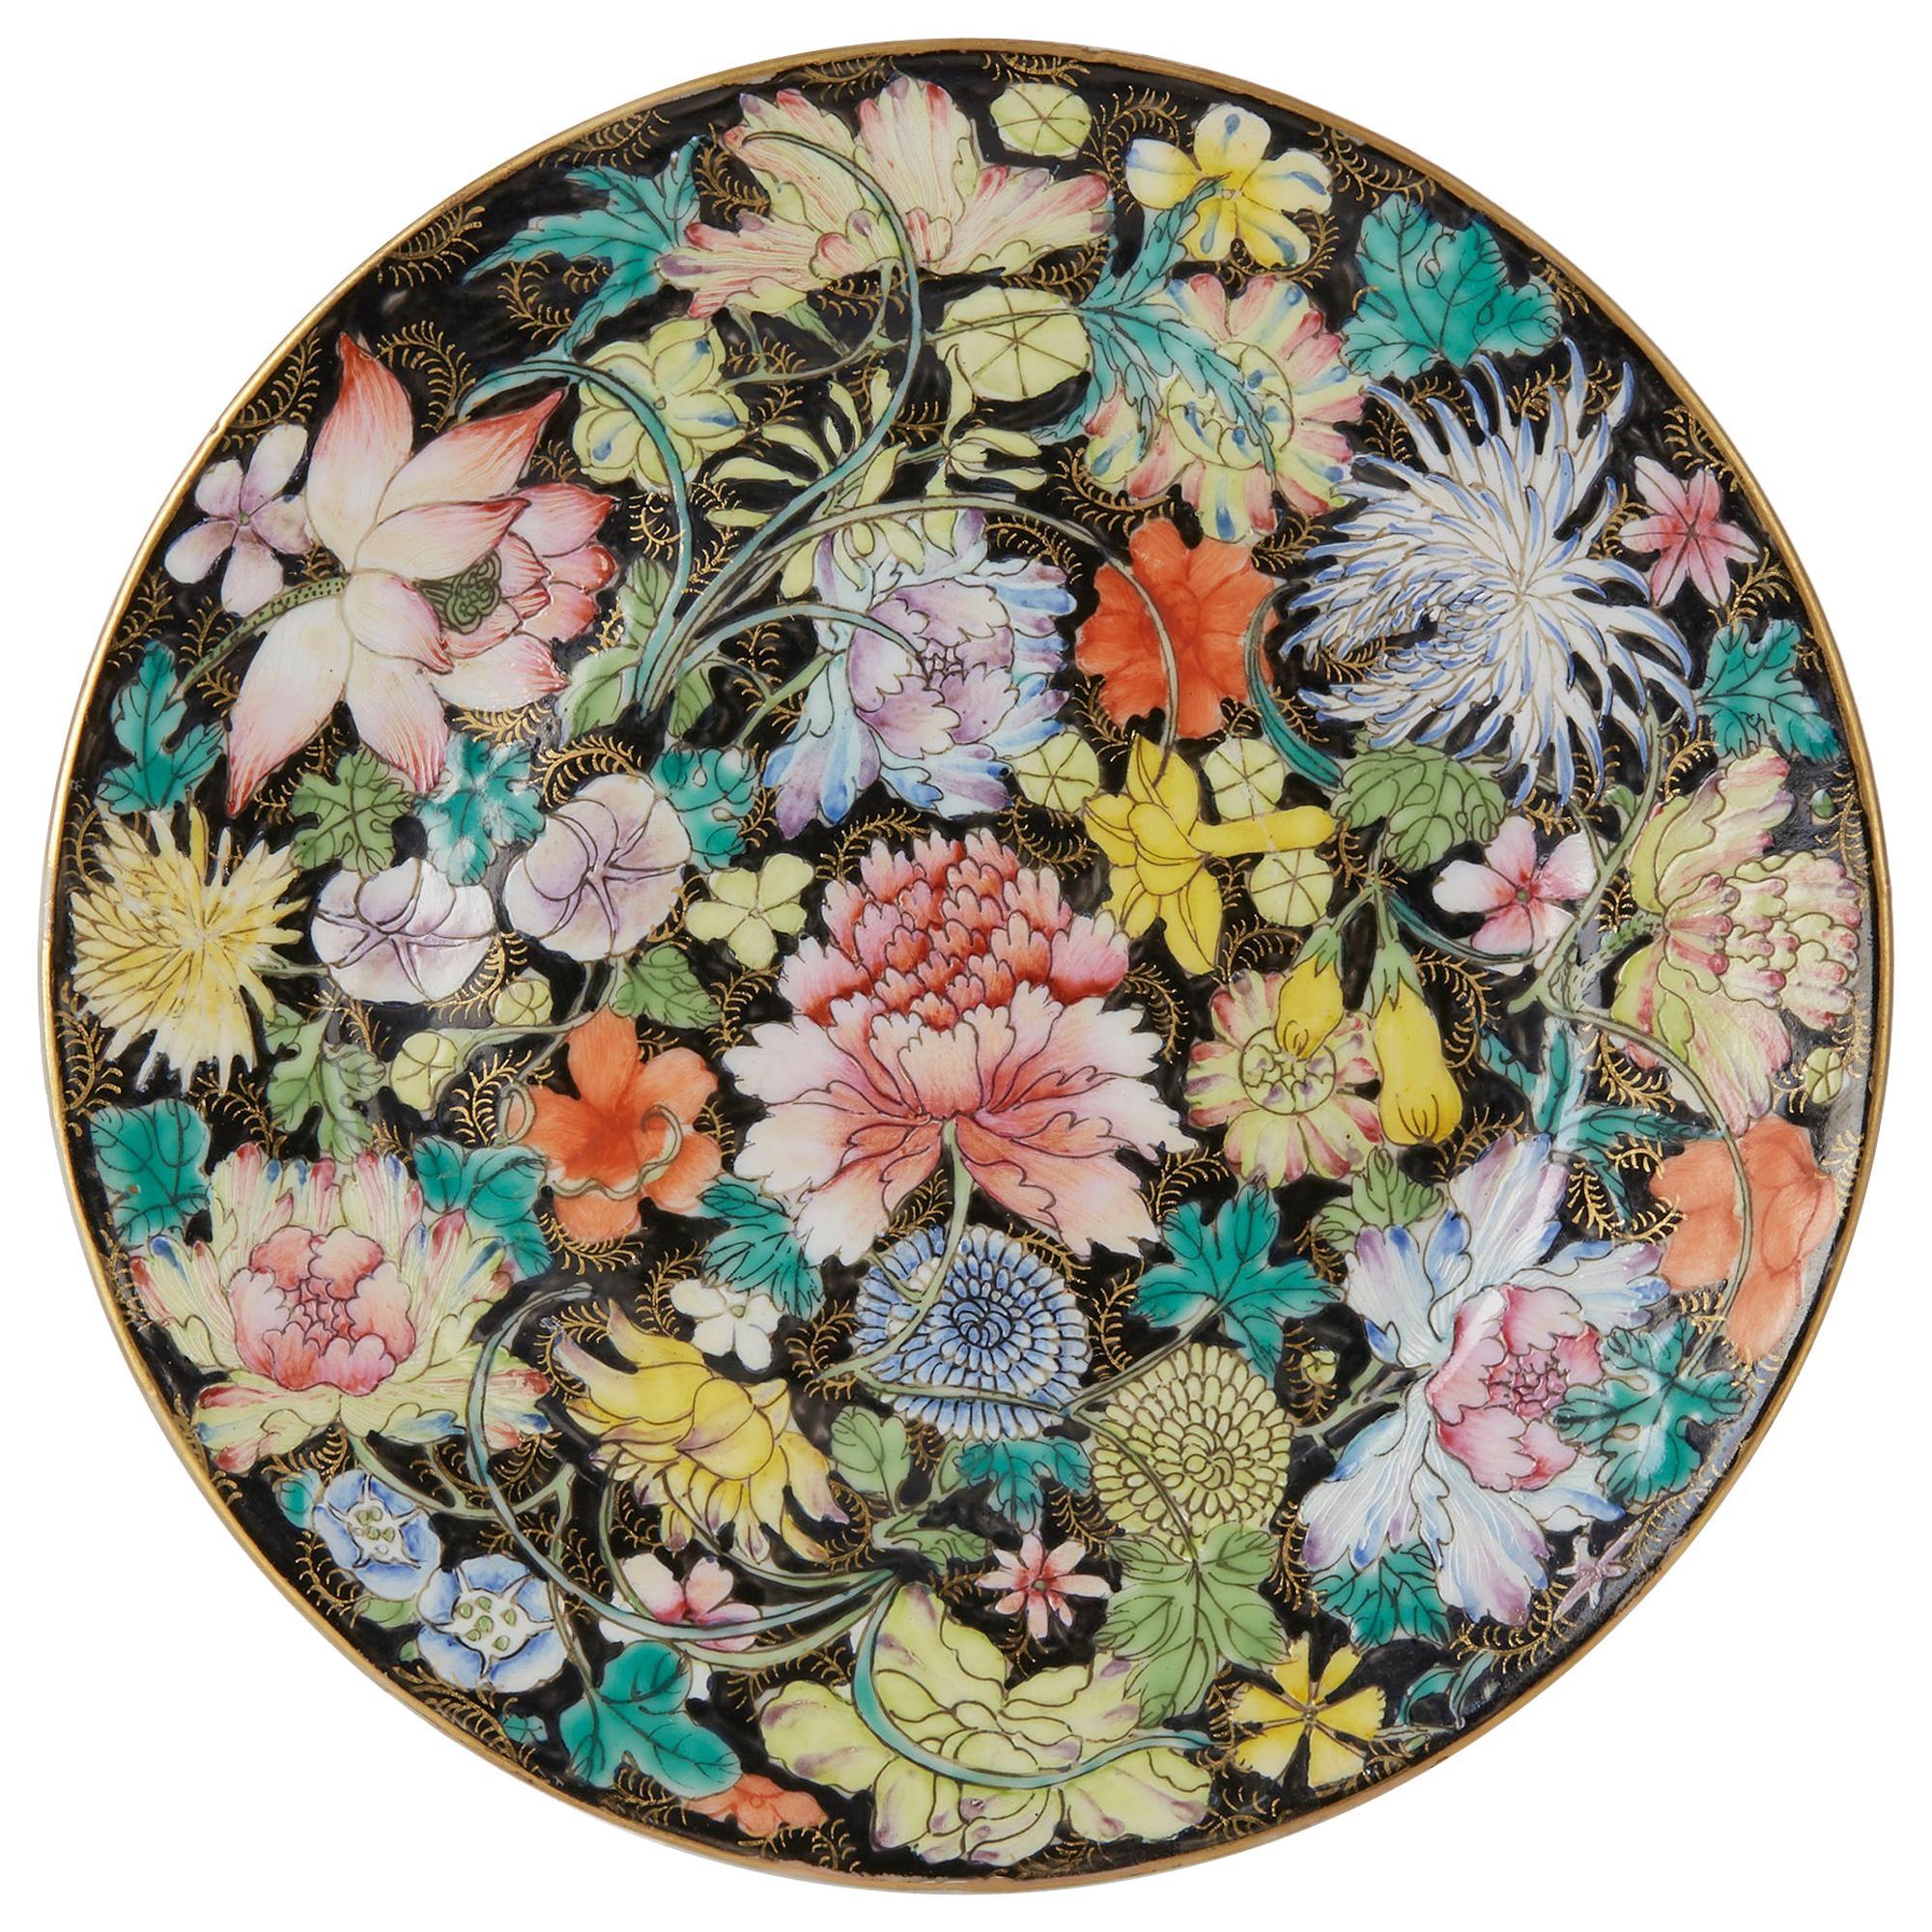 Chinese Guangxu Millefleur Plate, 1875-1908